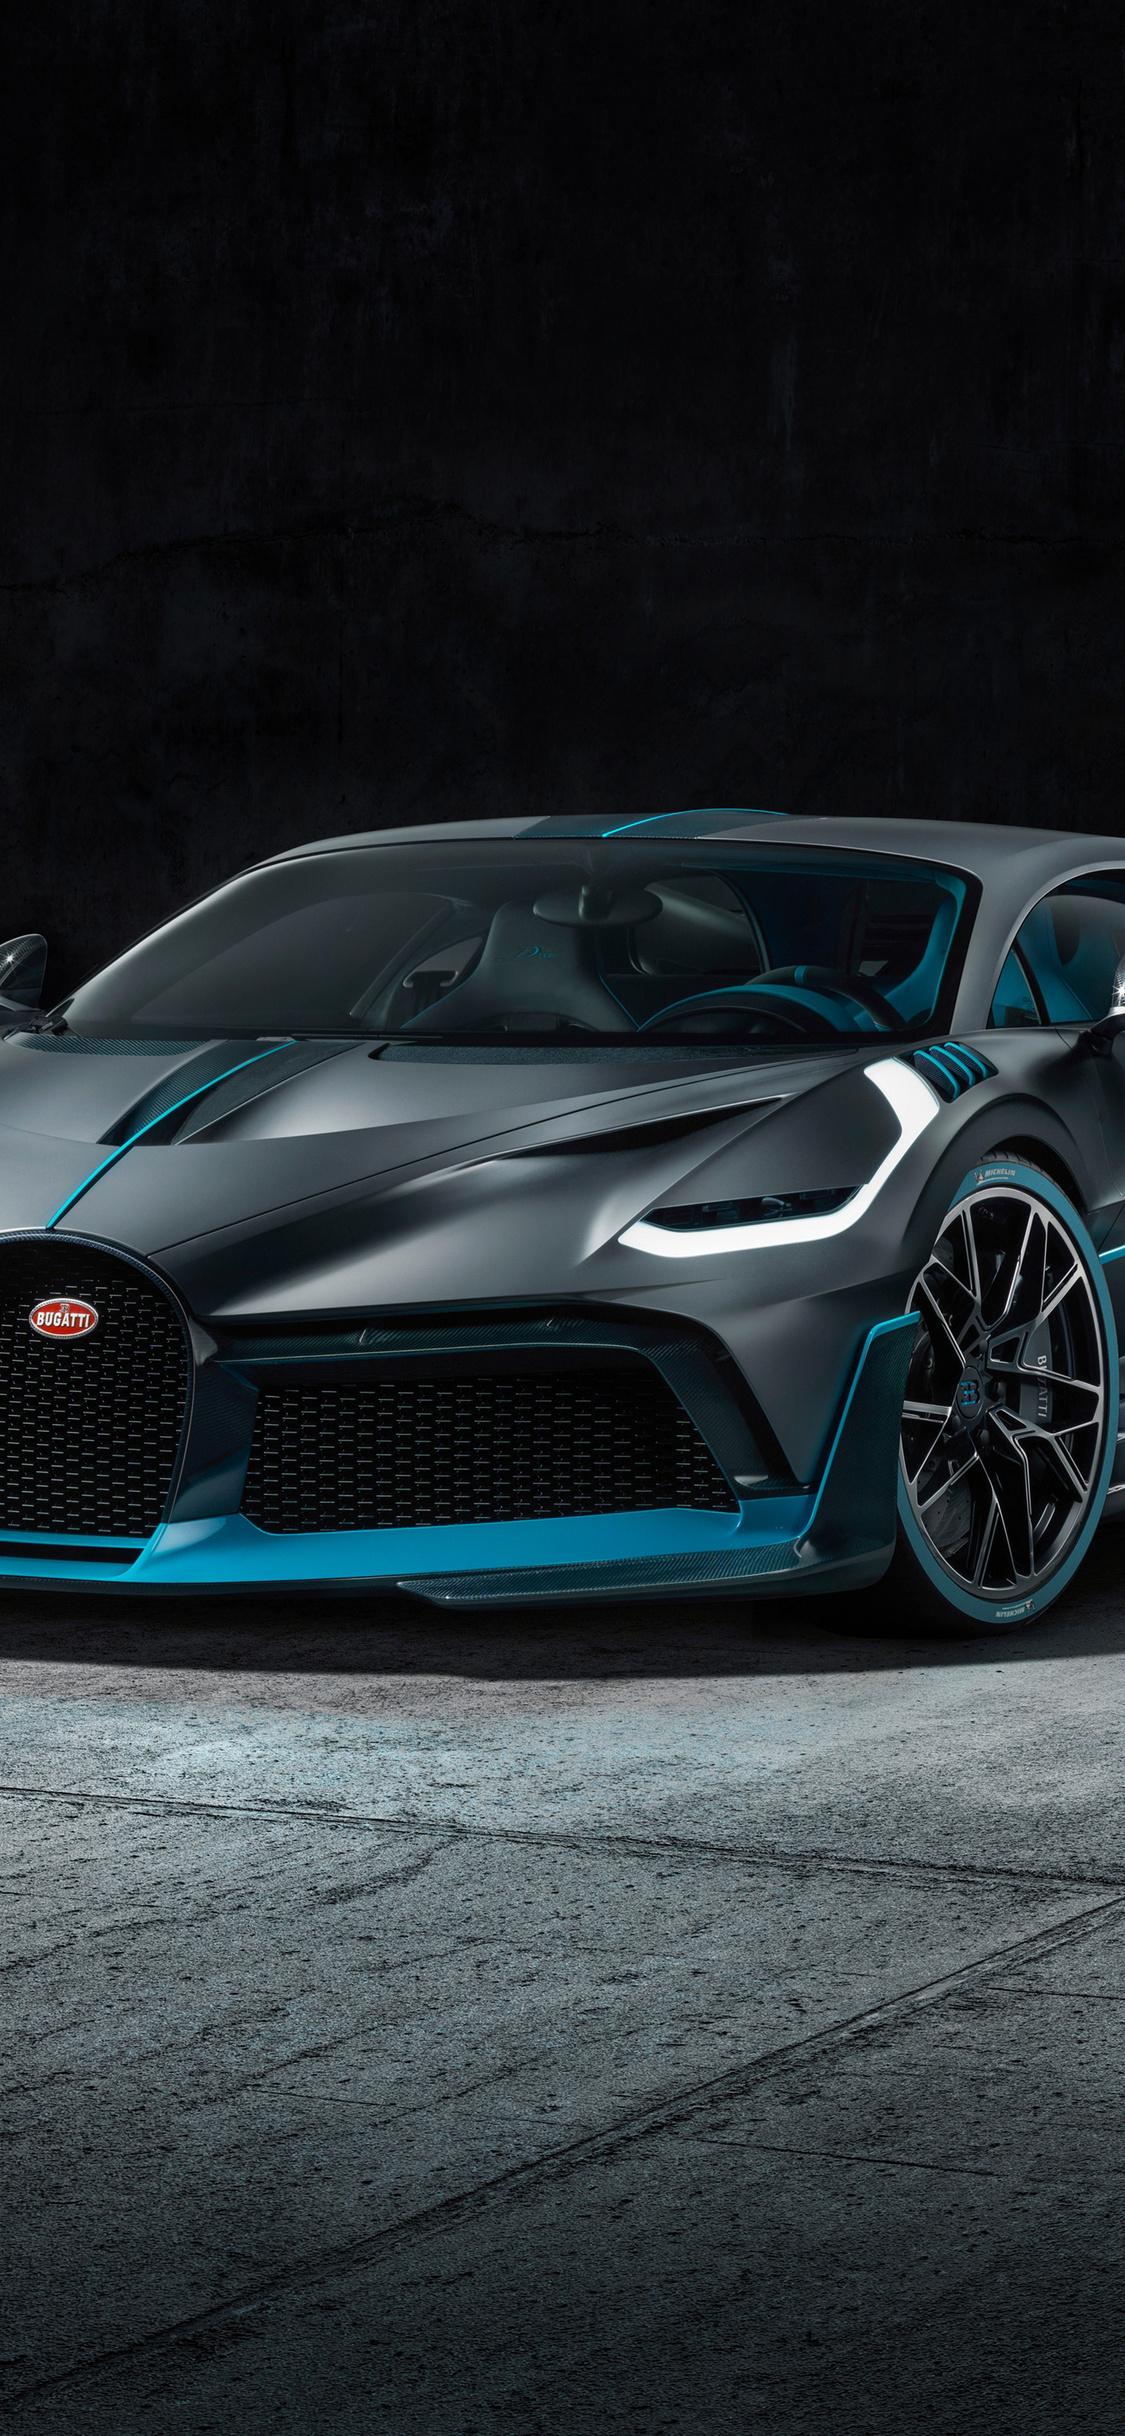 1125x2436 Bugatti Divo 2018 4k Iphone Xs Iphone 10 Iphone X Hd 4k